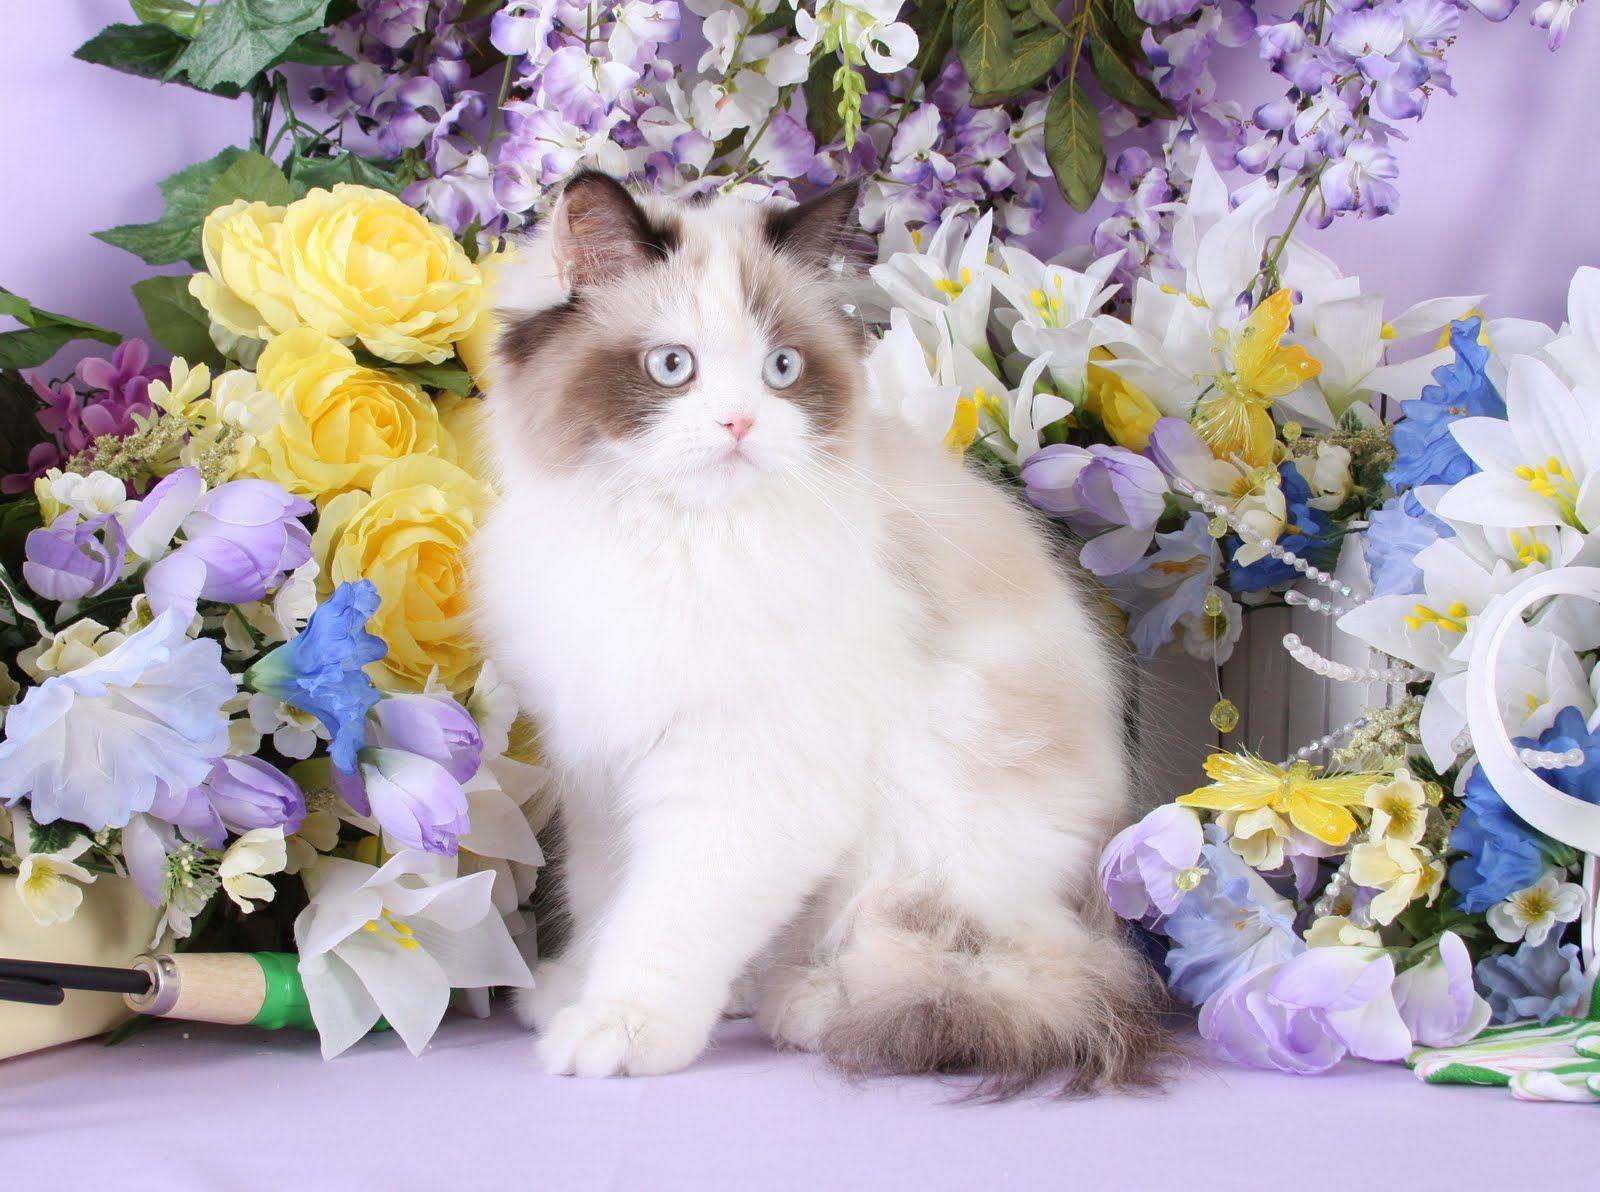 Himalayan Kittens For Sale Himalayan kitten, Spring